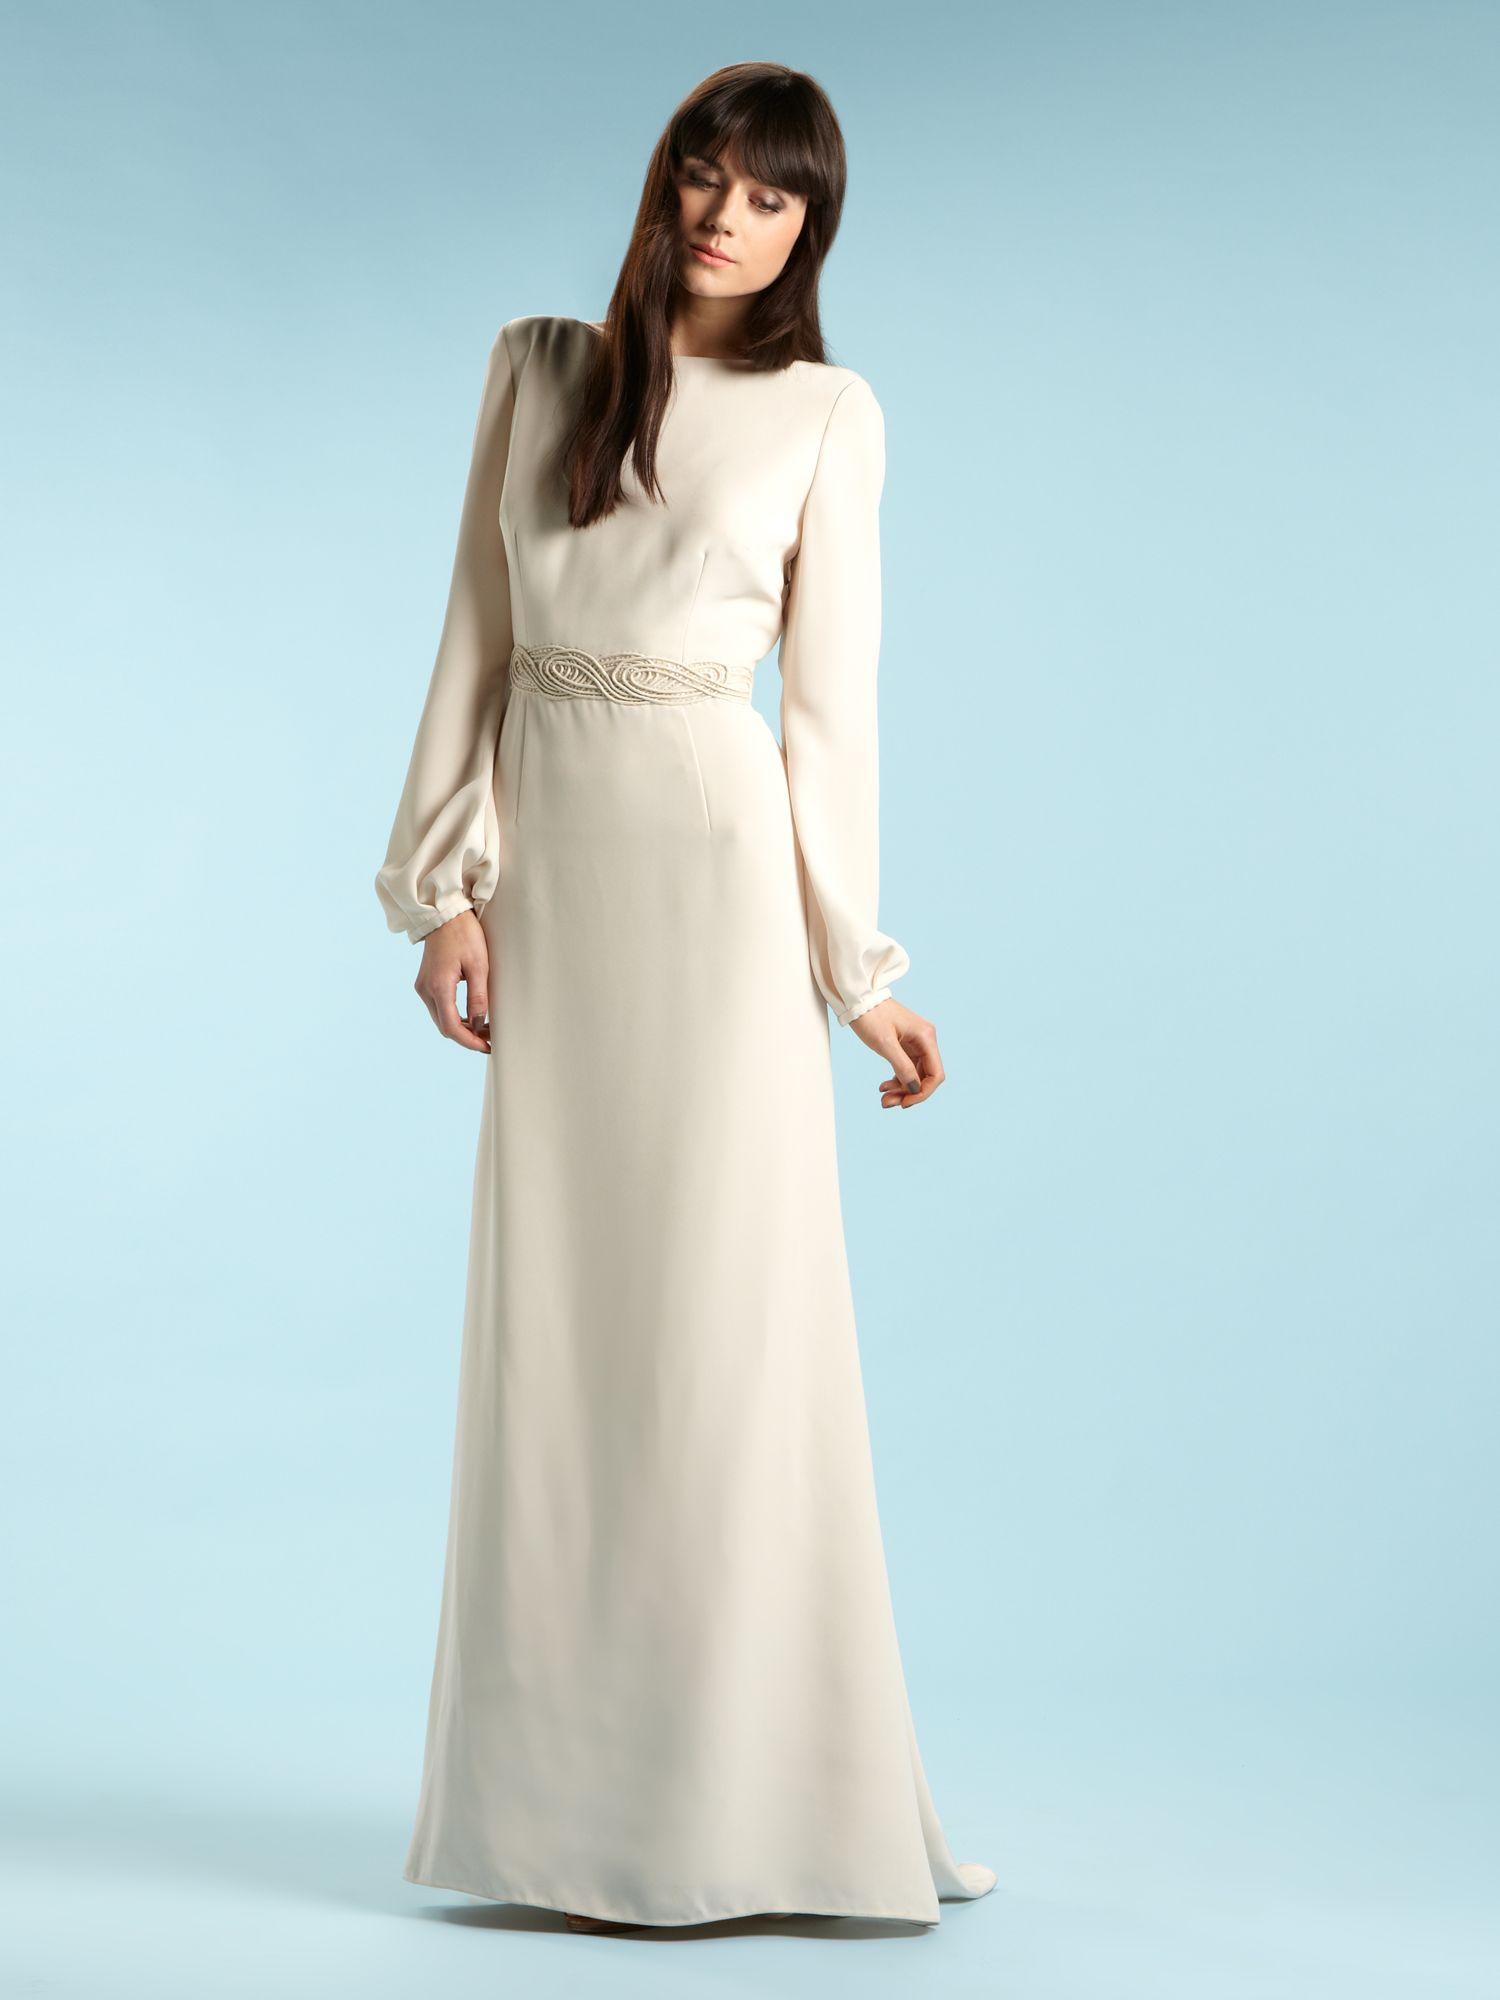 Perfect Wedding Dress Budget Component - All Wedding Dresses ...